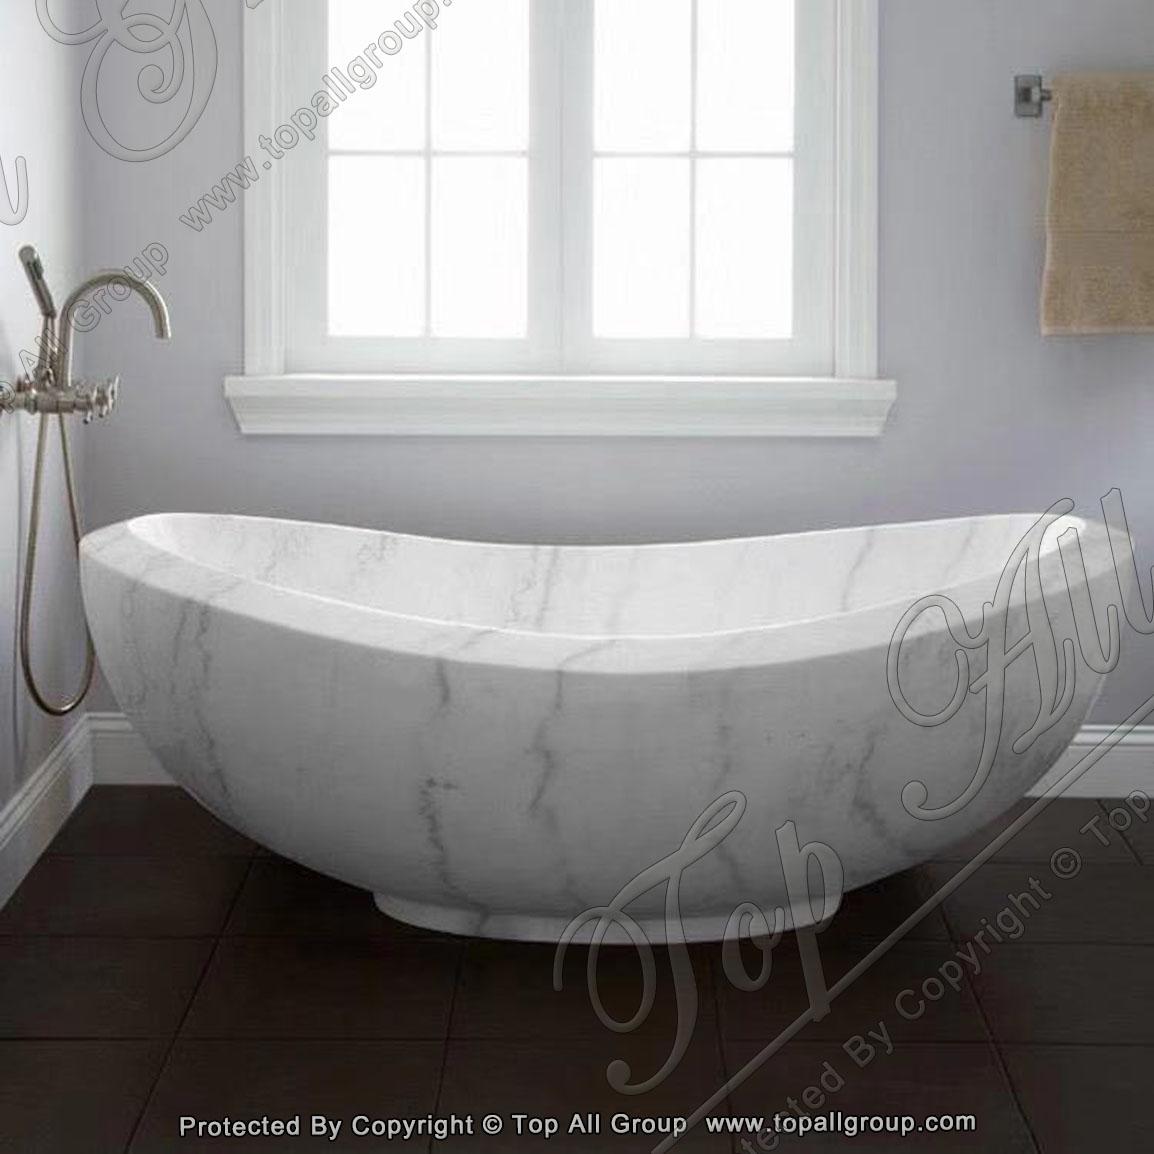 Nature white marble bathtub for bathroom